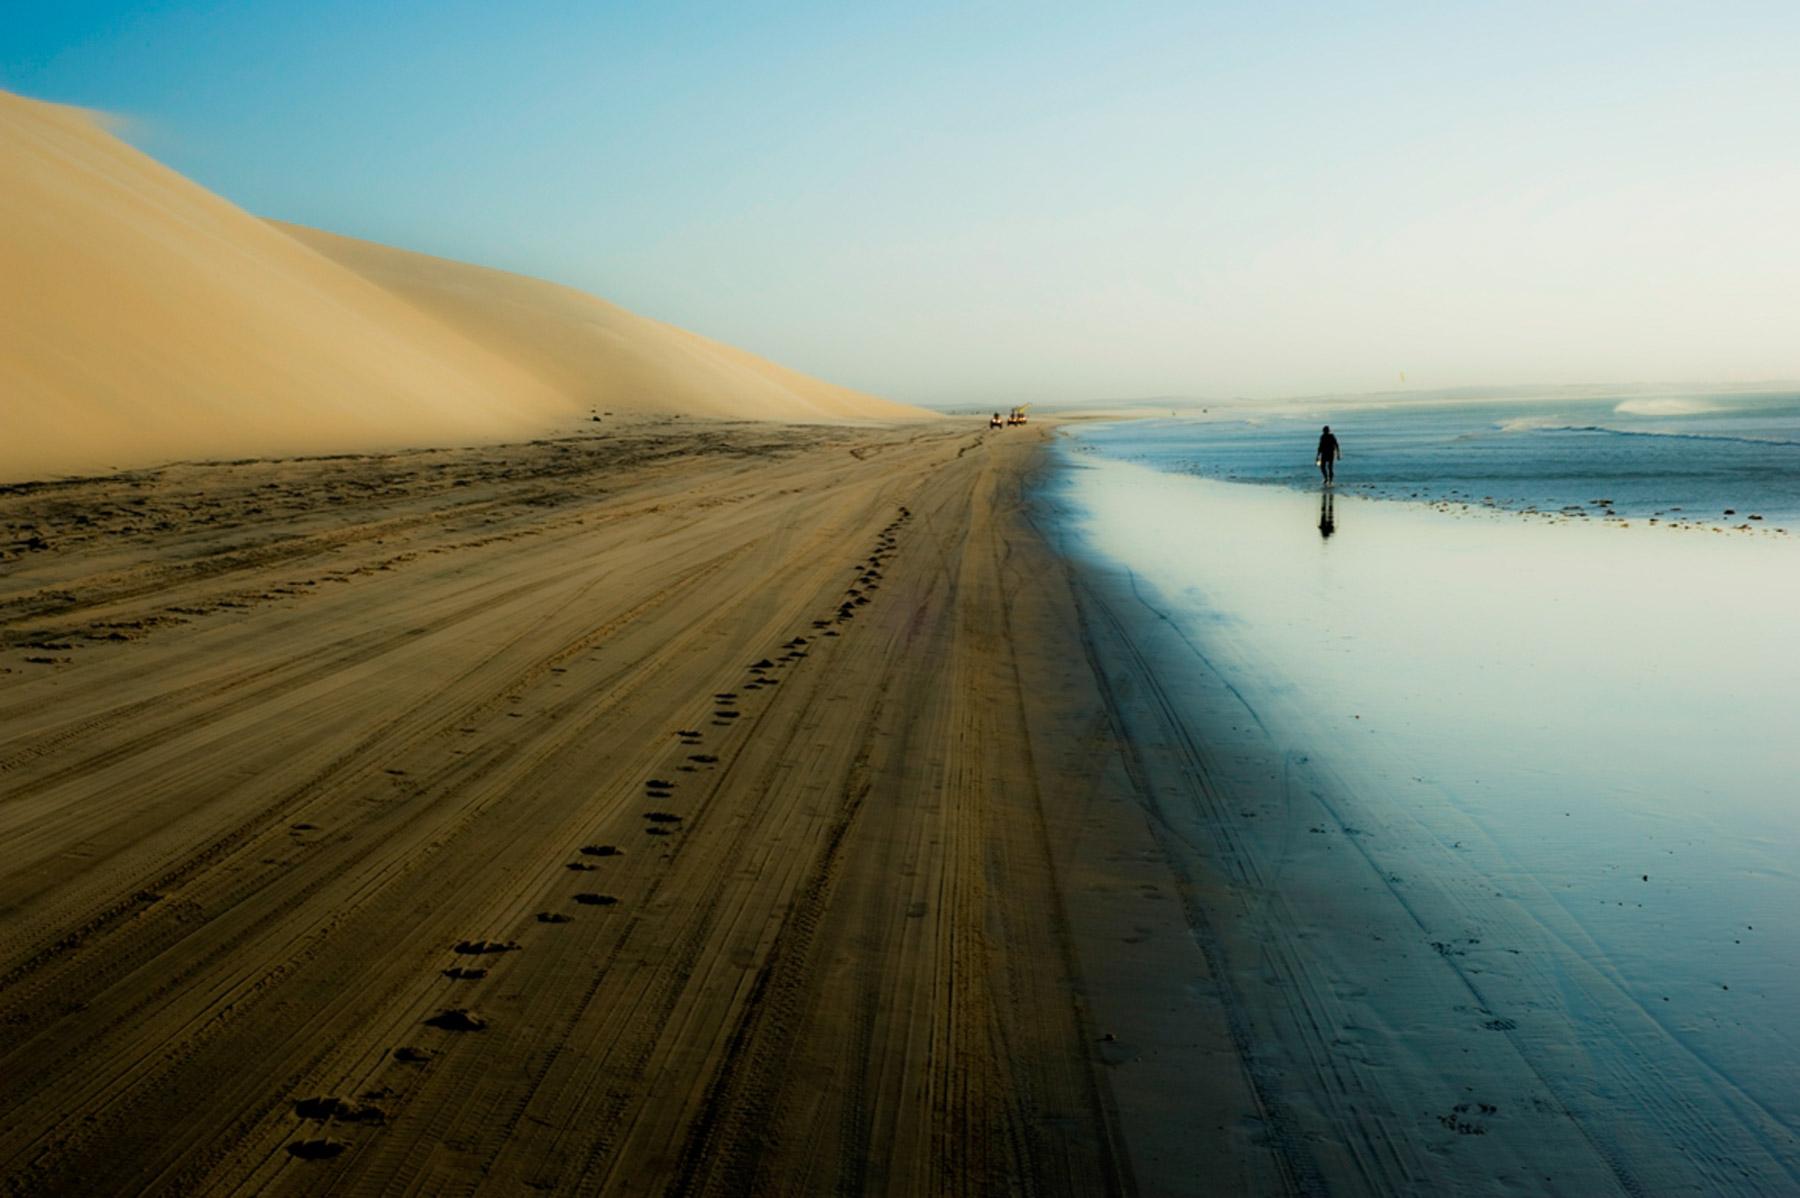 patricia-vanrespaille-photographer-life-through-my-lens-020.jpg